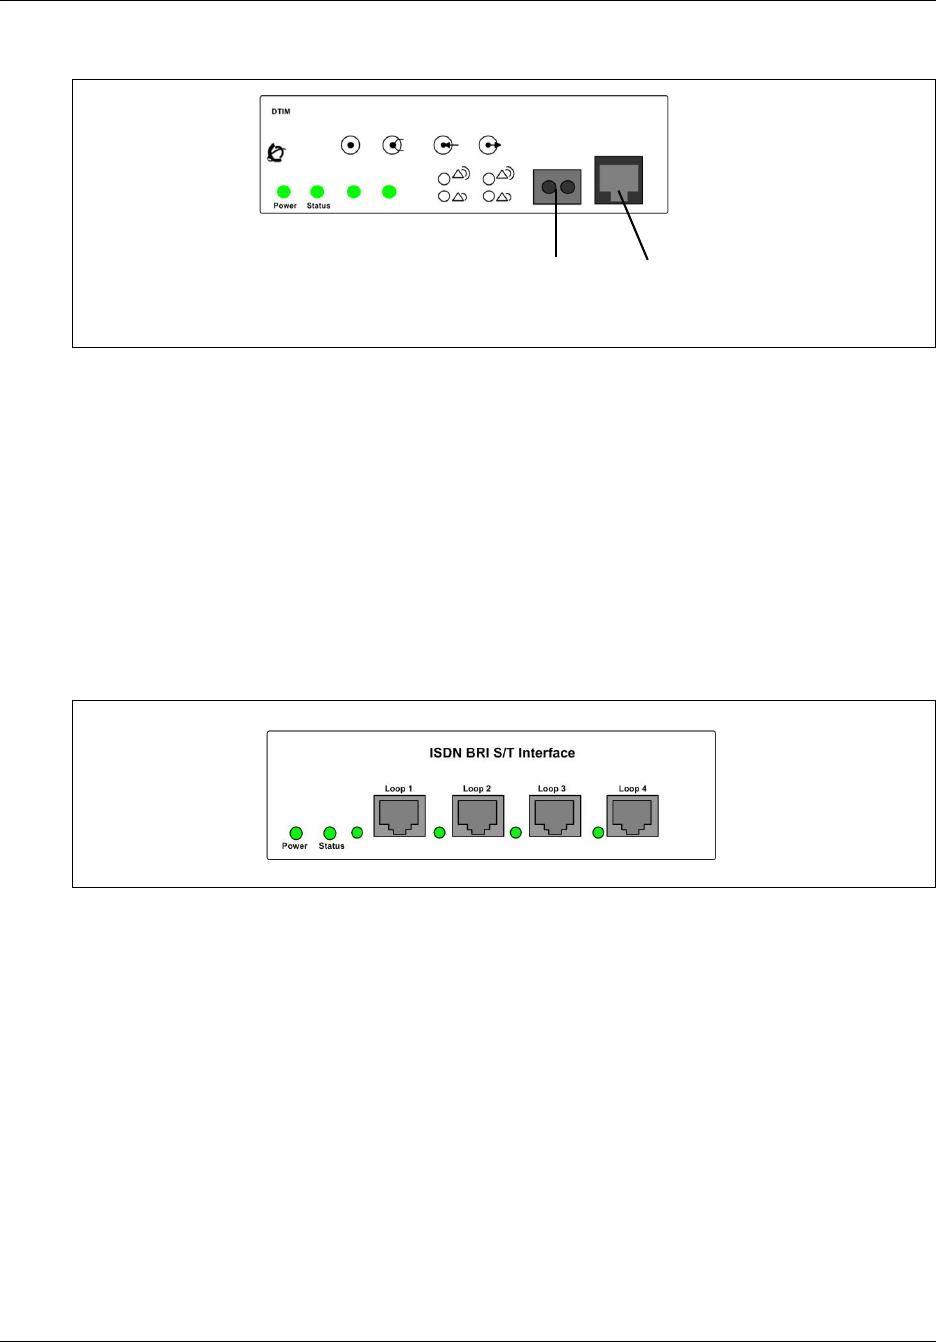 isdn wiring diagram isdn wiring diagram auto wiring diagrams  isdn wiring diagram auto wiring diagrams